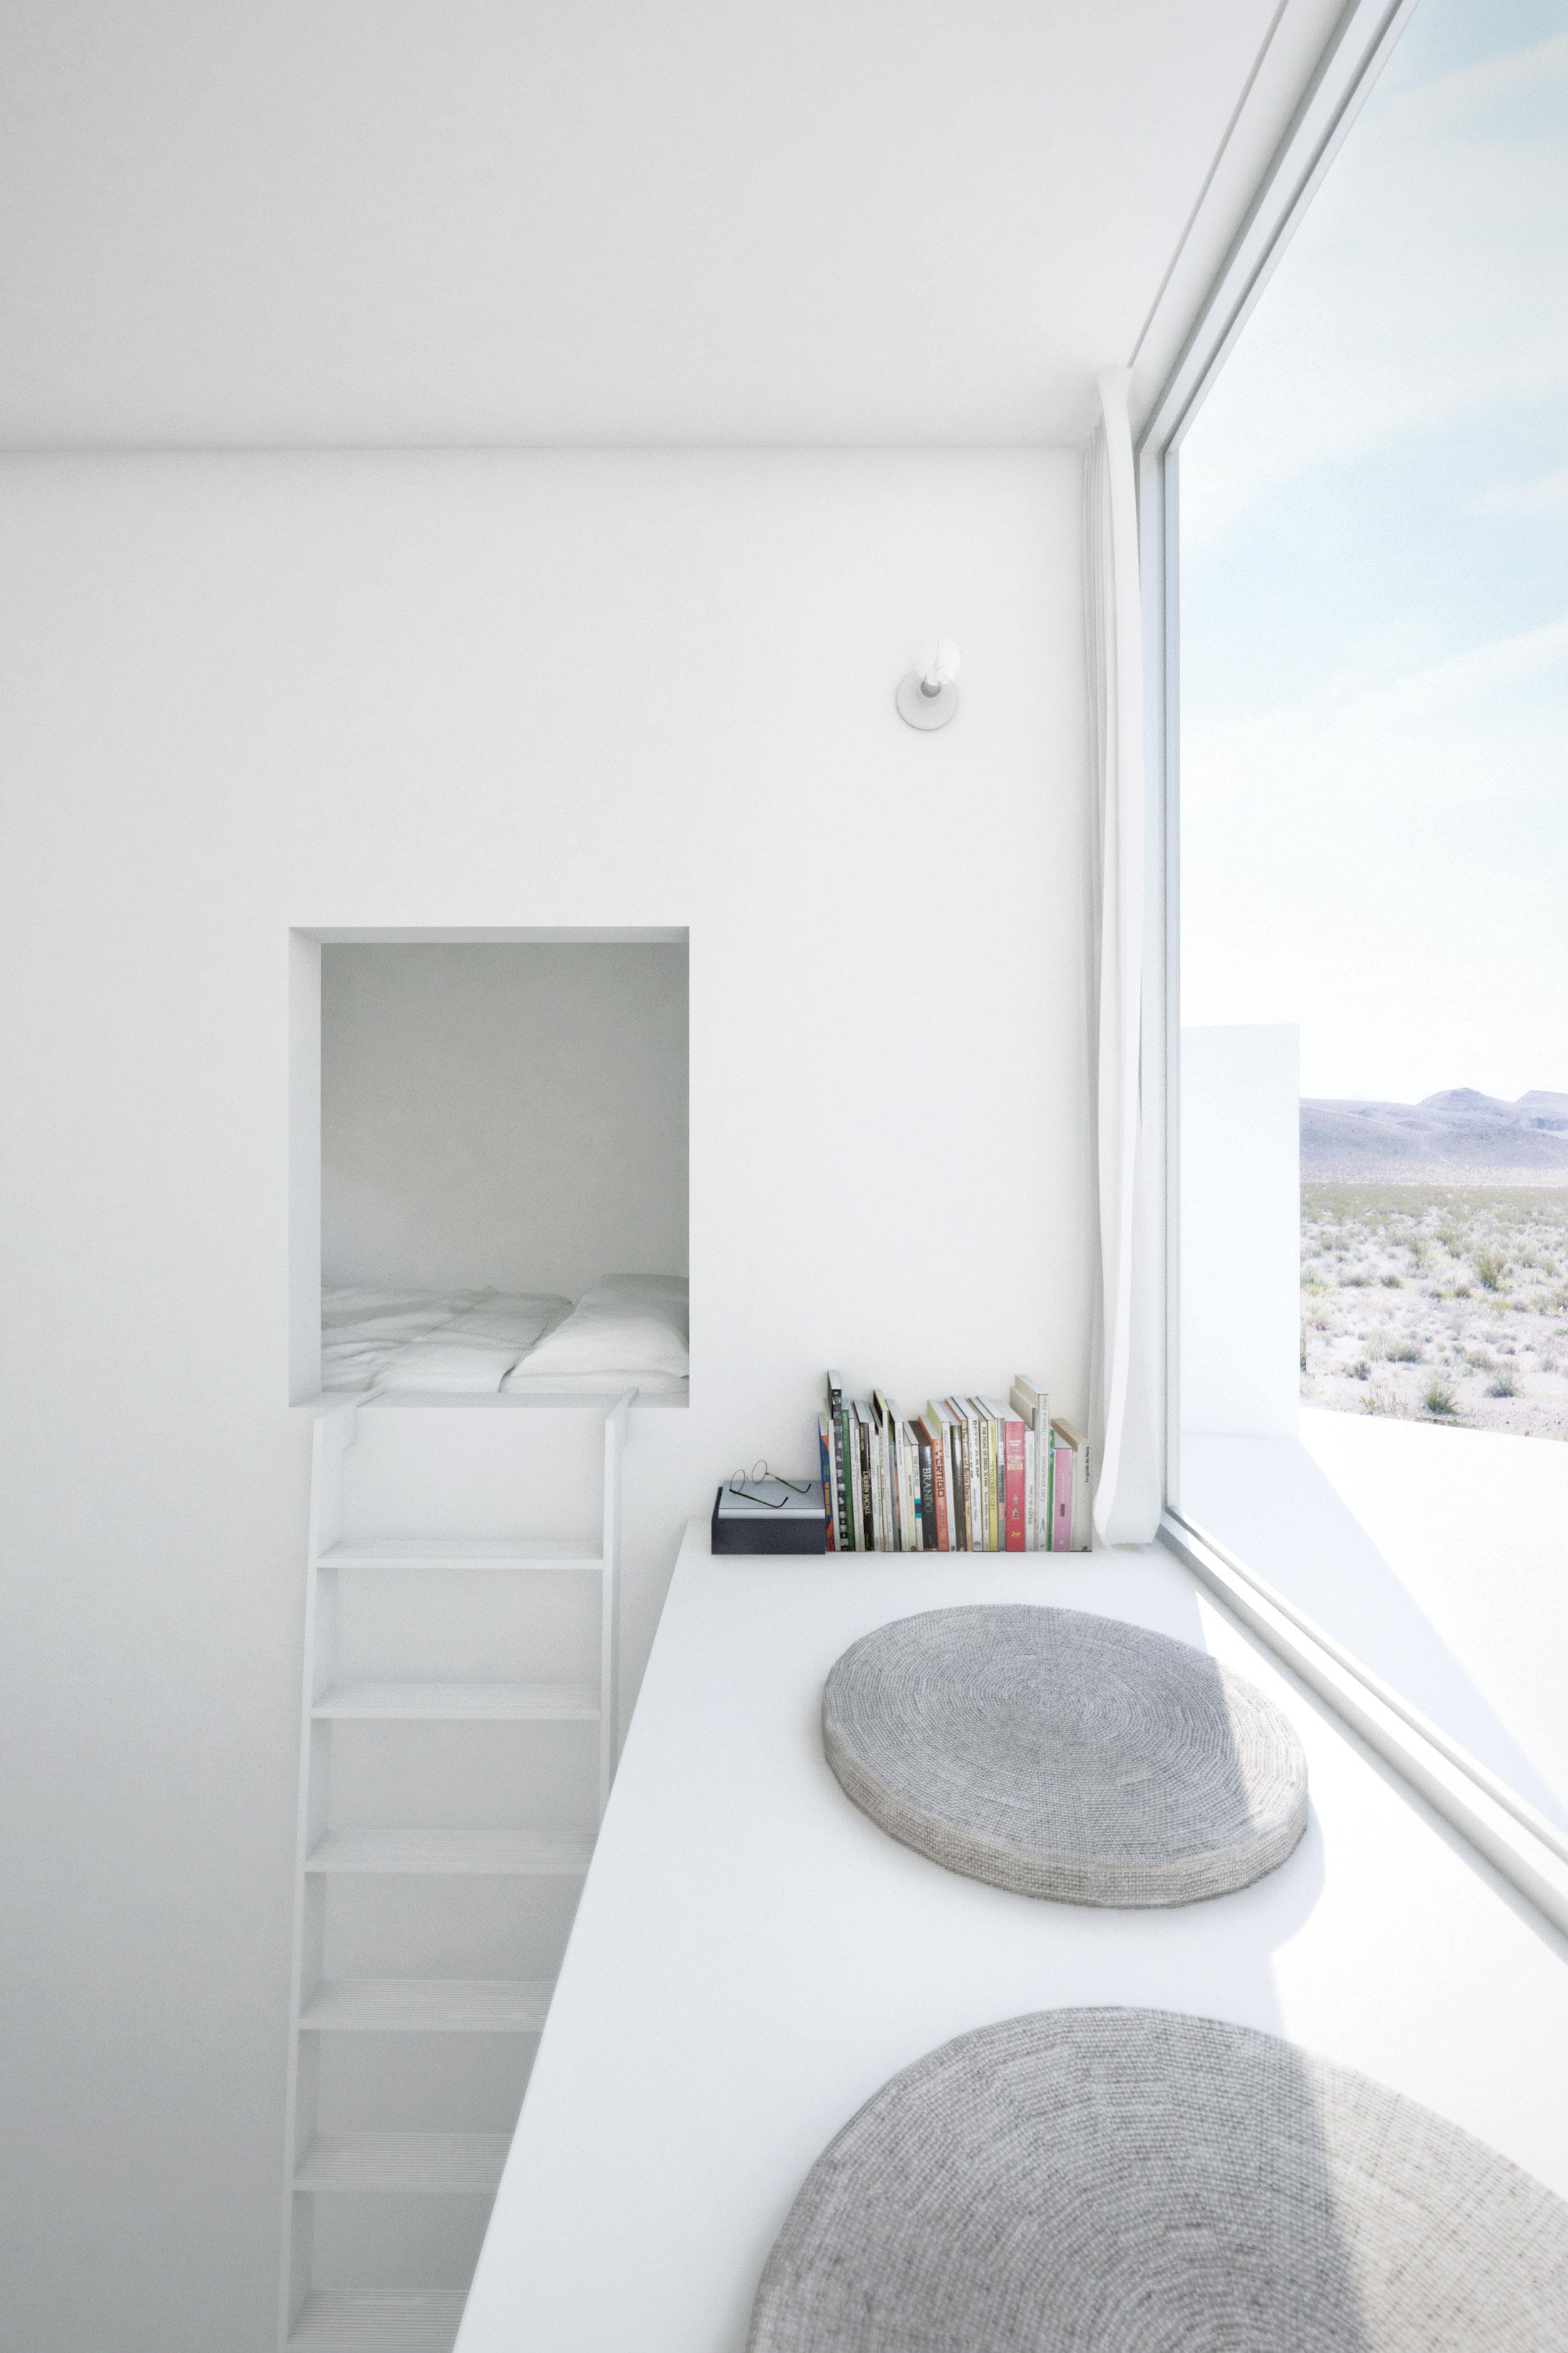 concept privacy interior sunrise suite